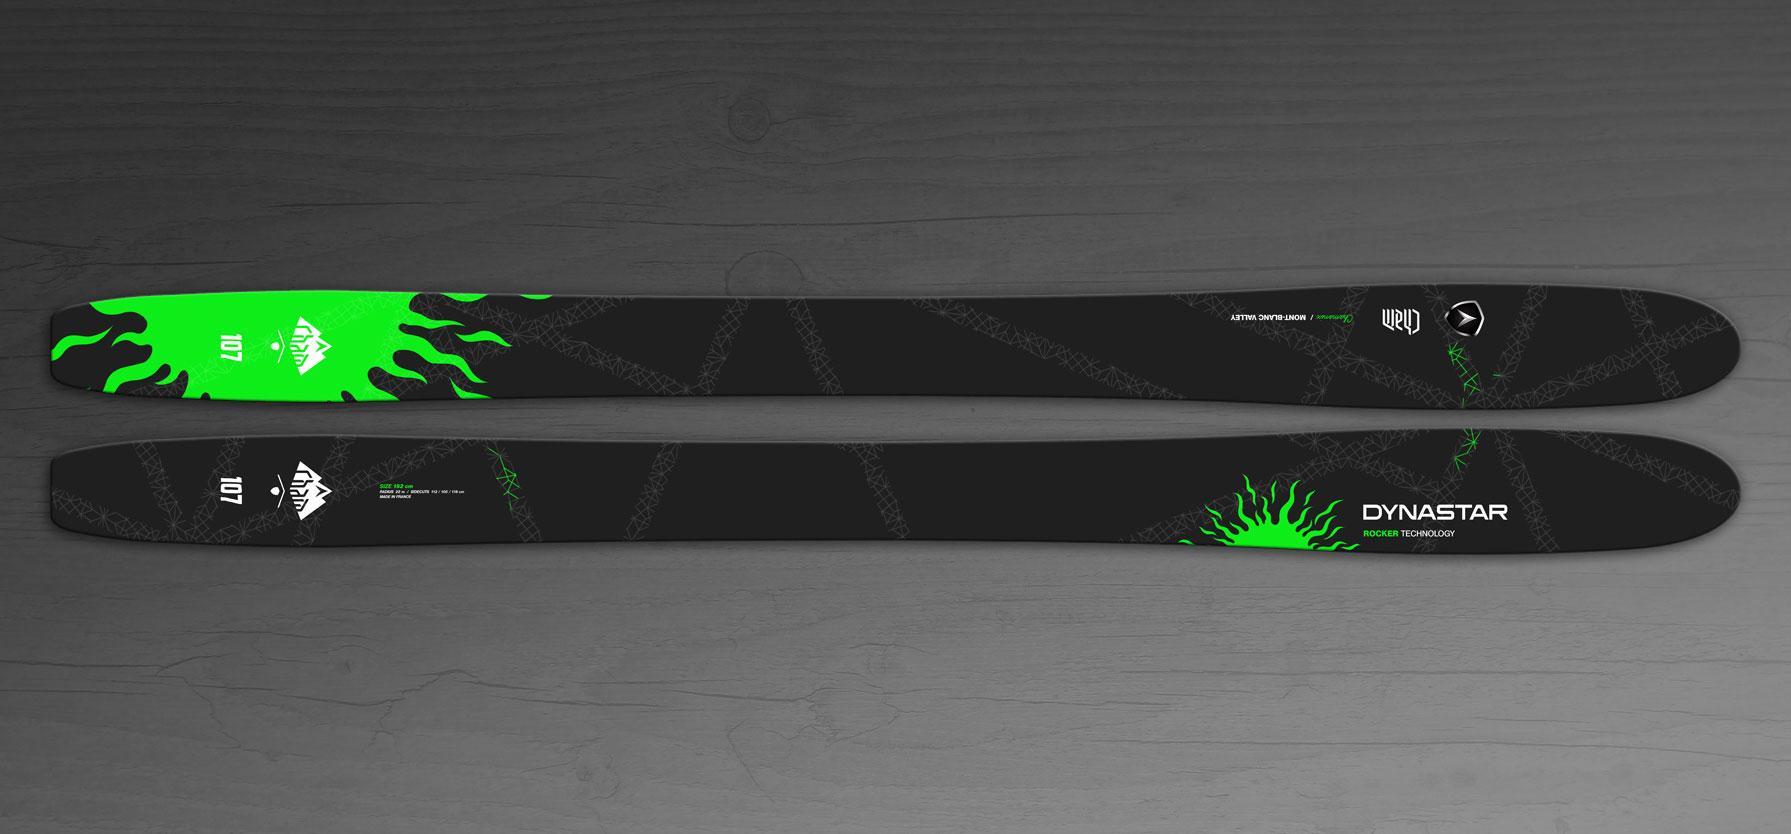 dynastar-skis-powertrack-05